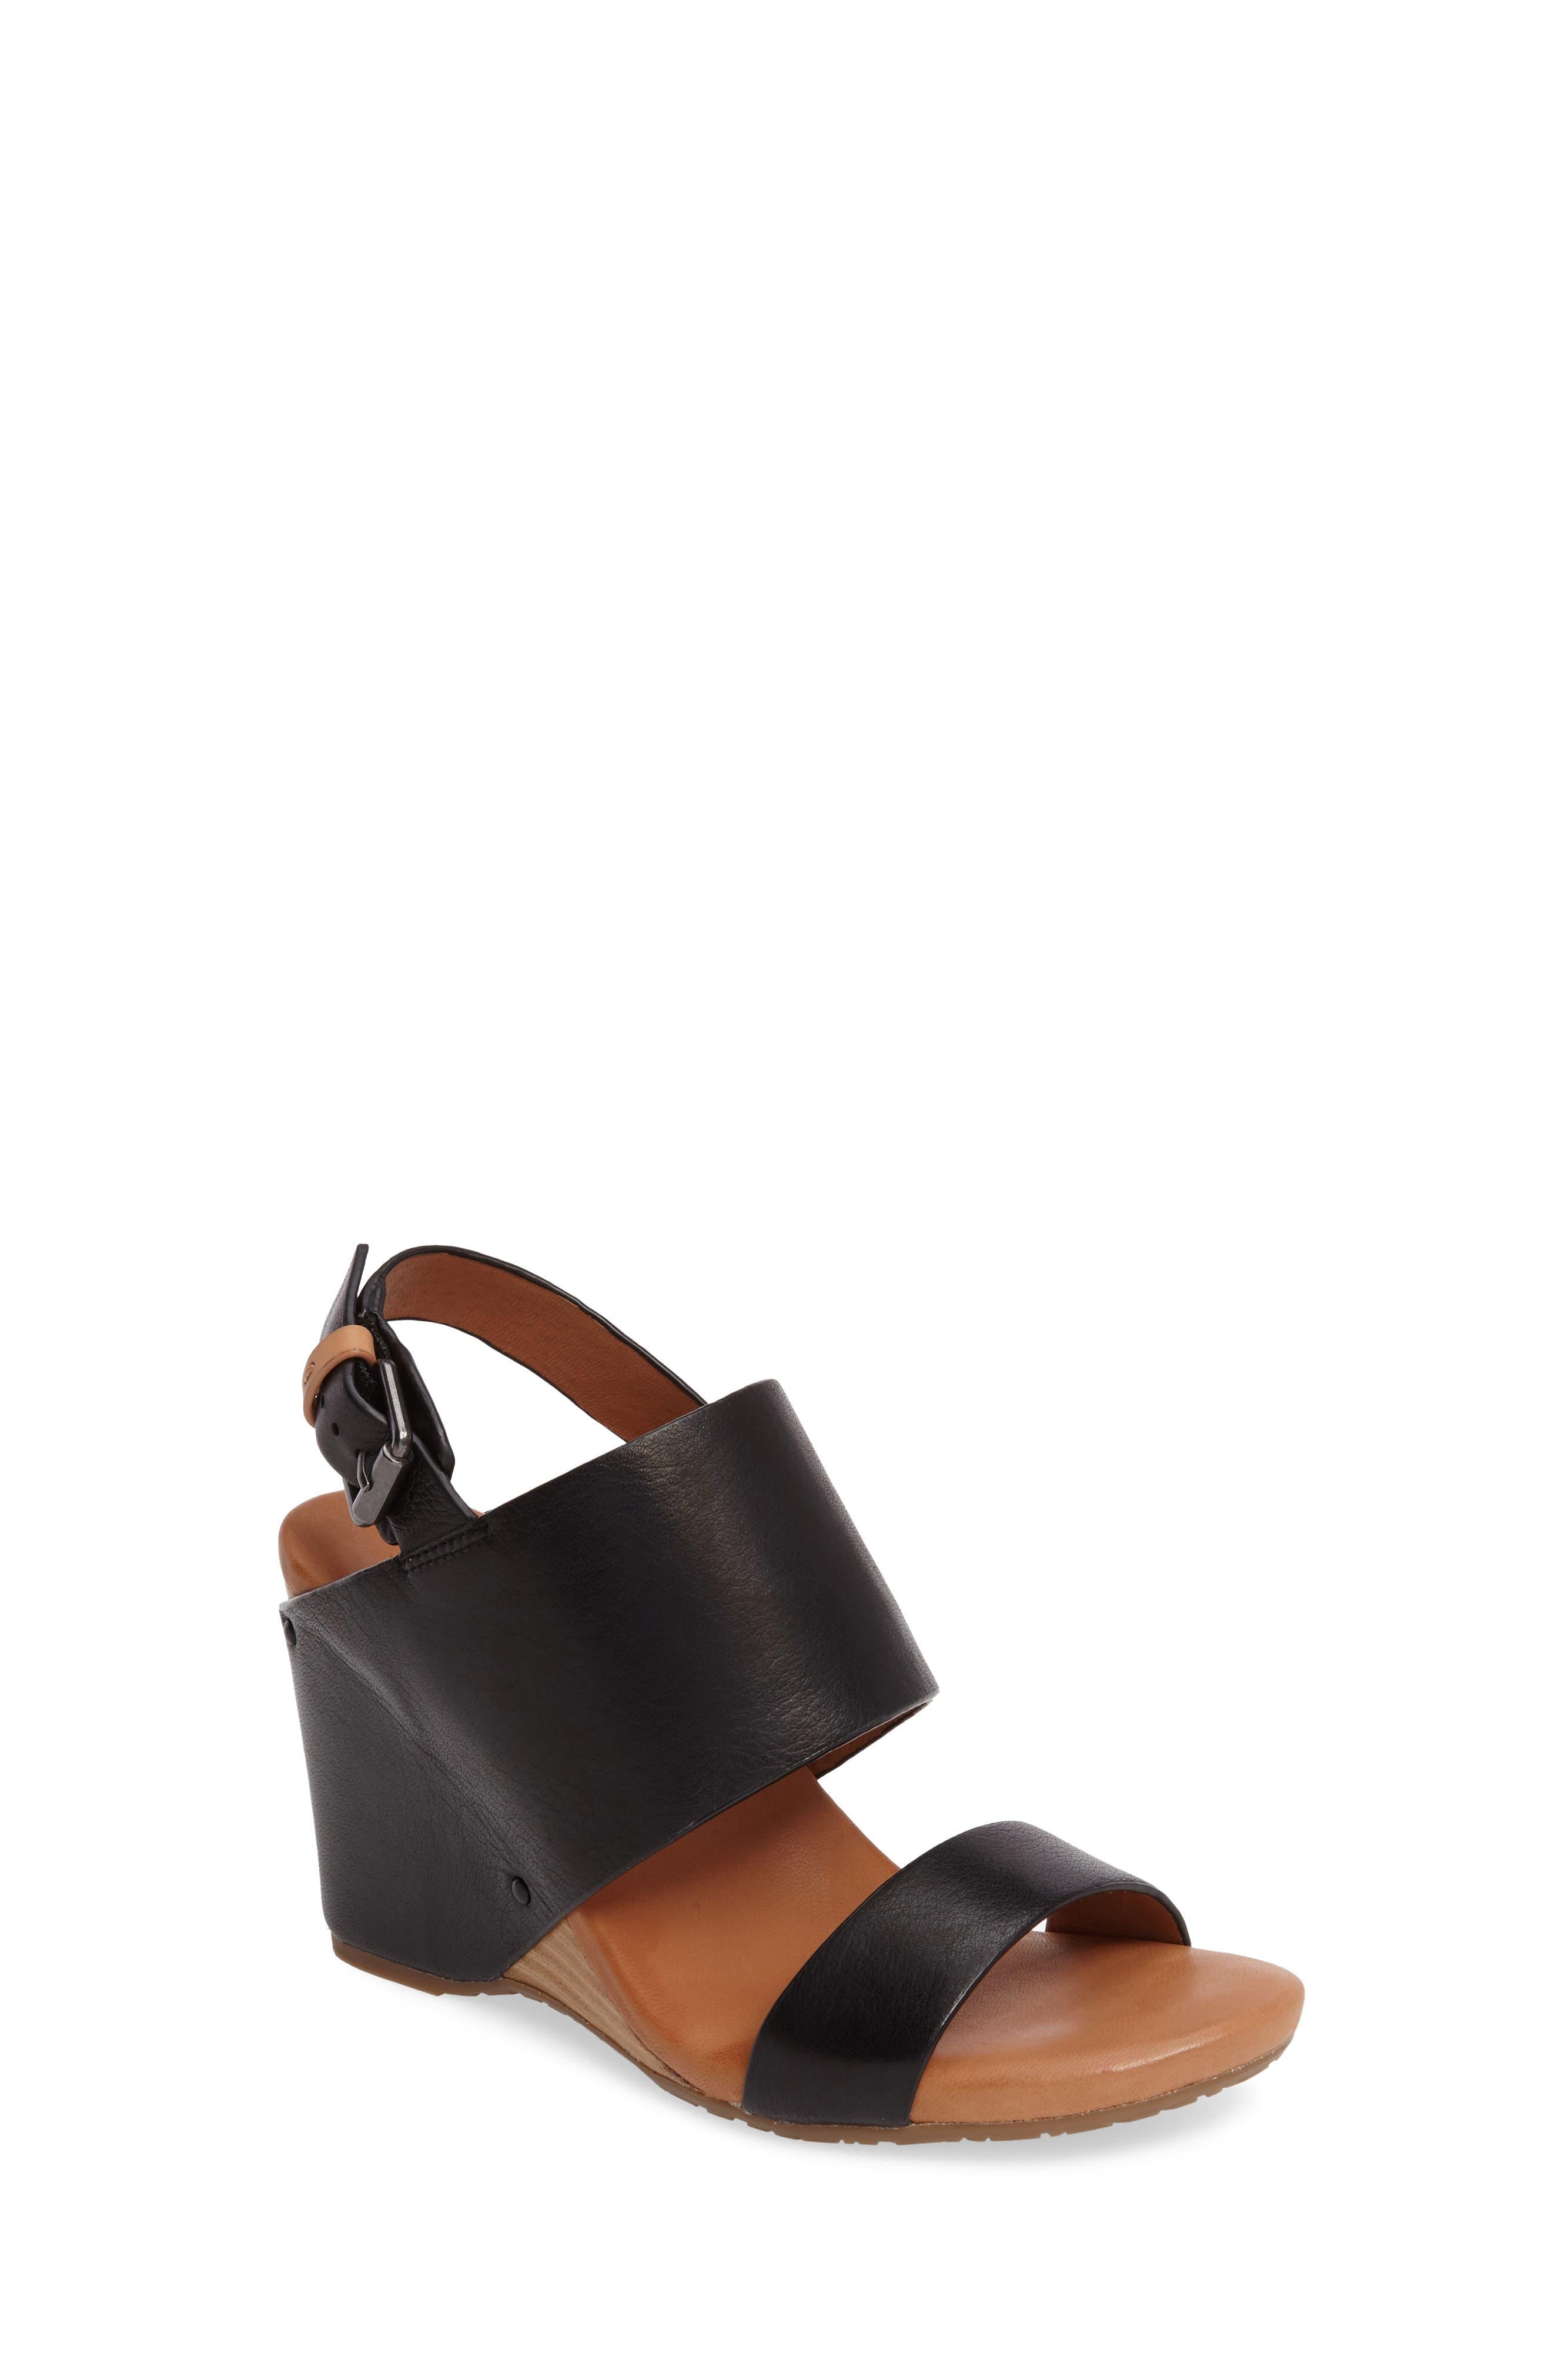 Inka Wedge Sandal,                         Main,                         color, 001